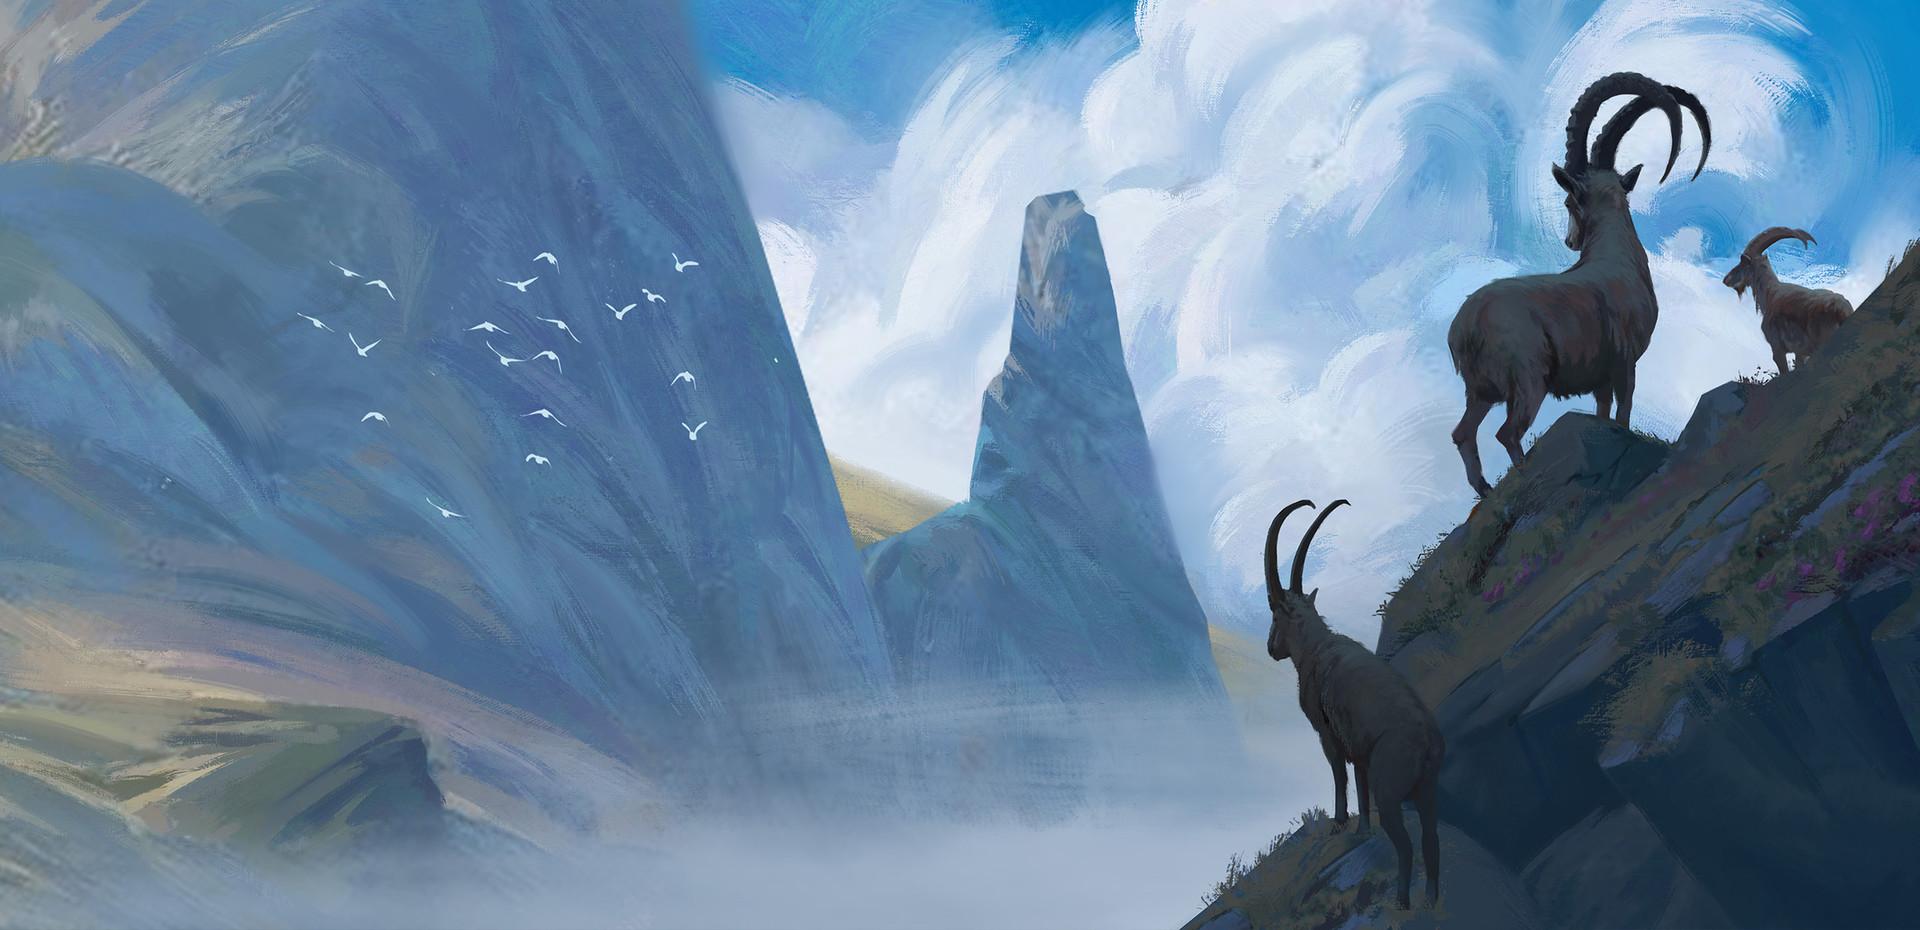 Toly kivshar goat1